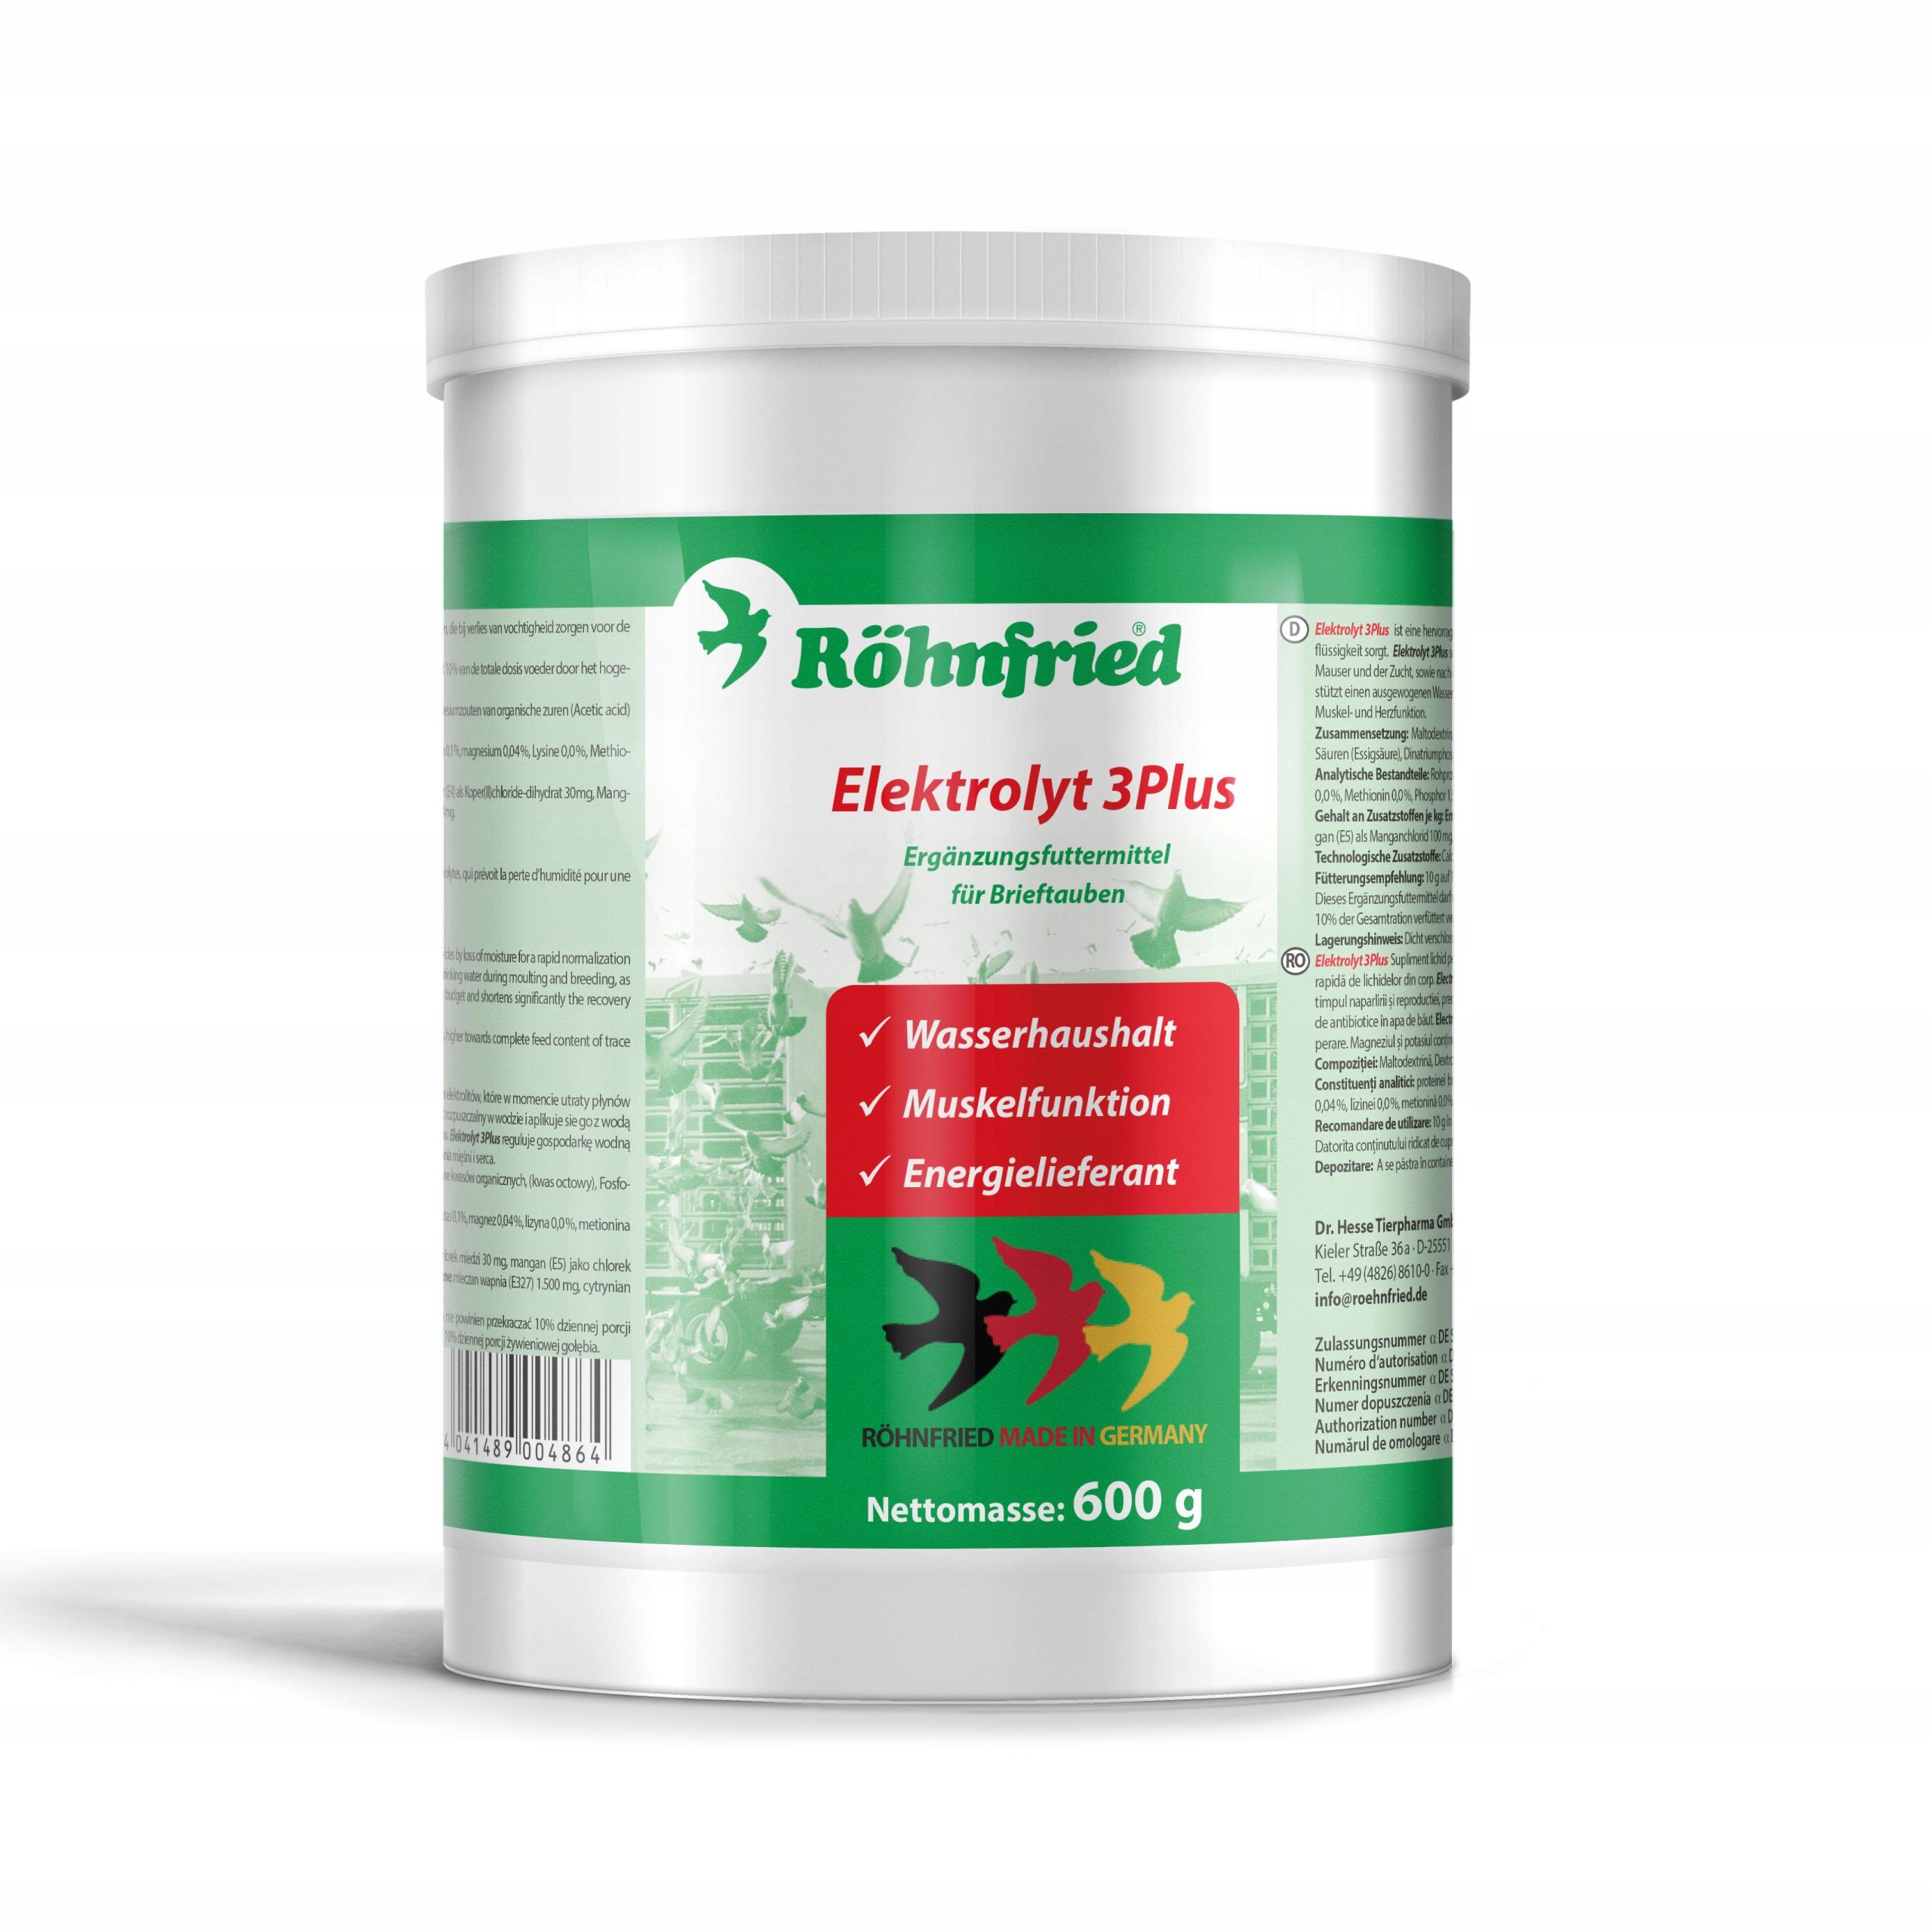 Rohnfried - Elektrolyt 3Plus - 600 г (электролит)